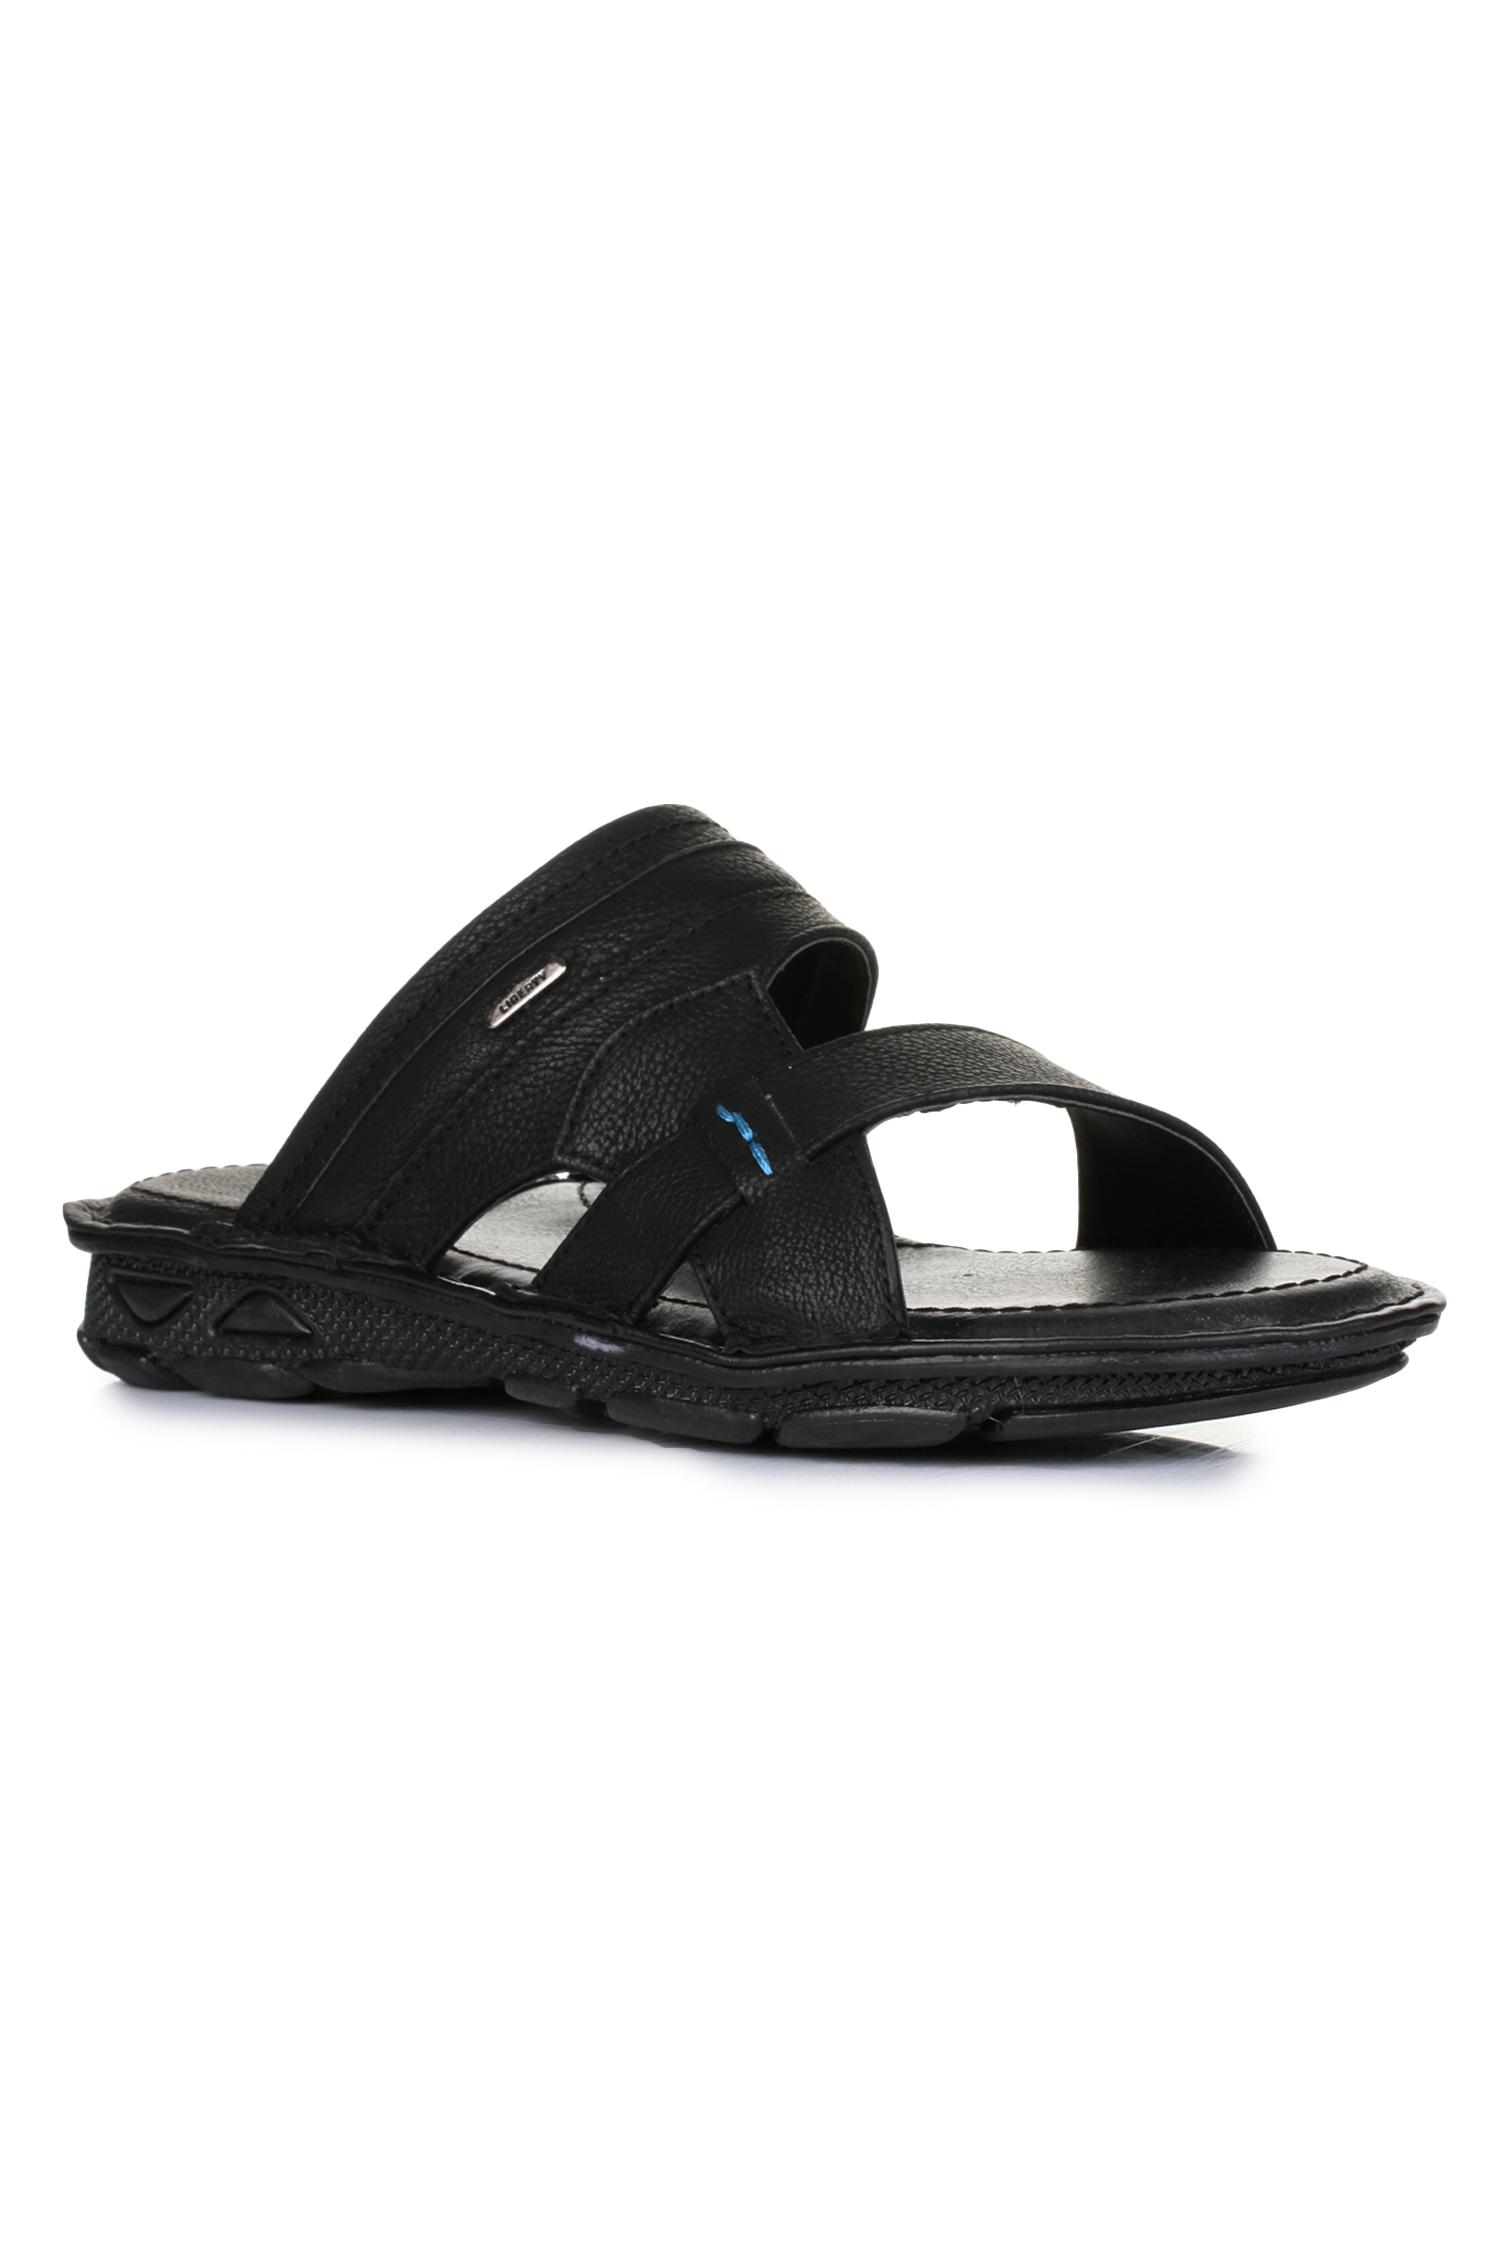 Liberty | Liberty Coolers Black Casual Slippers LPC-4_Black For - Men